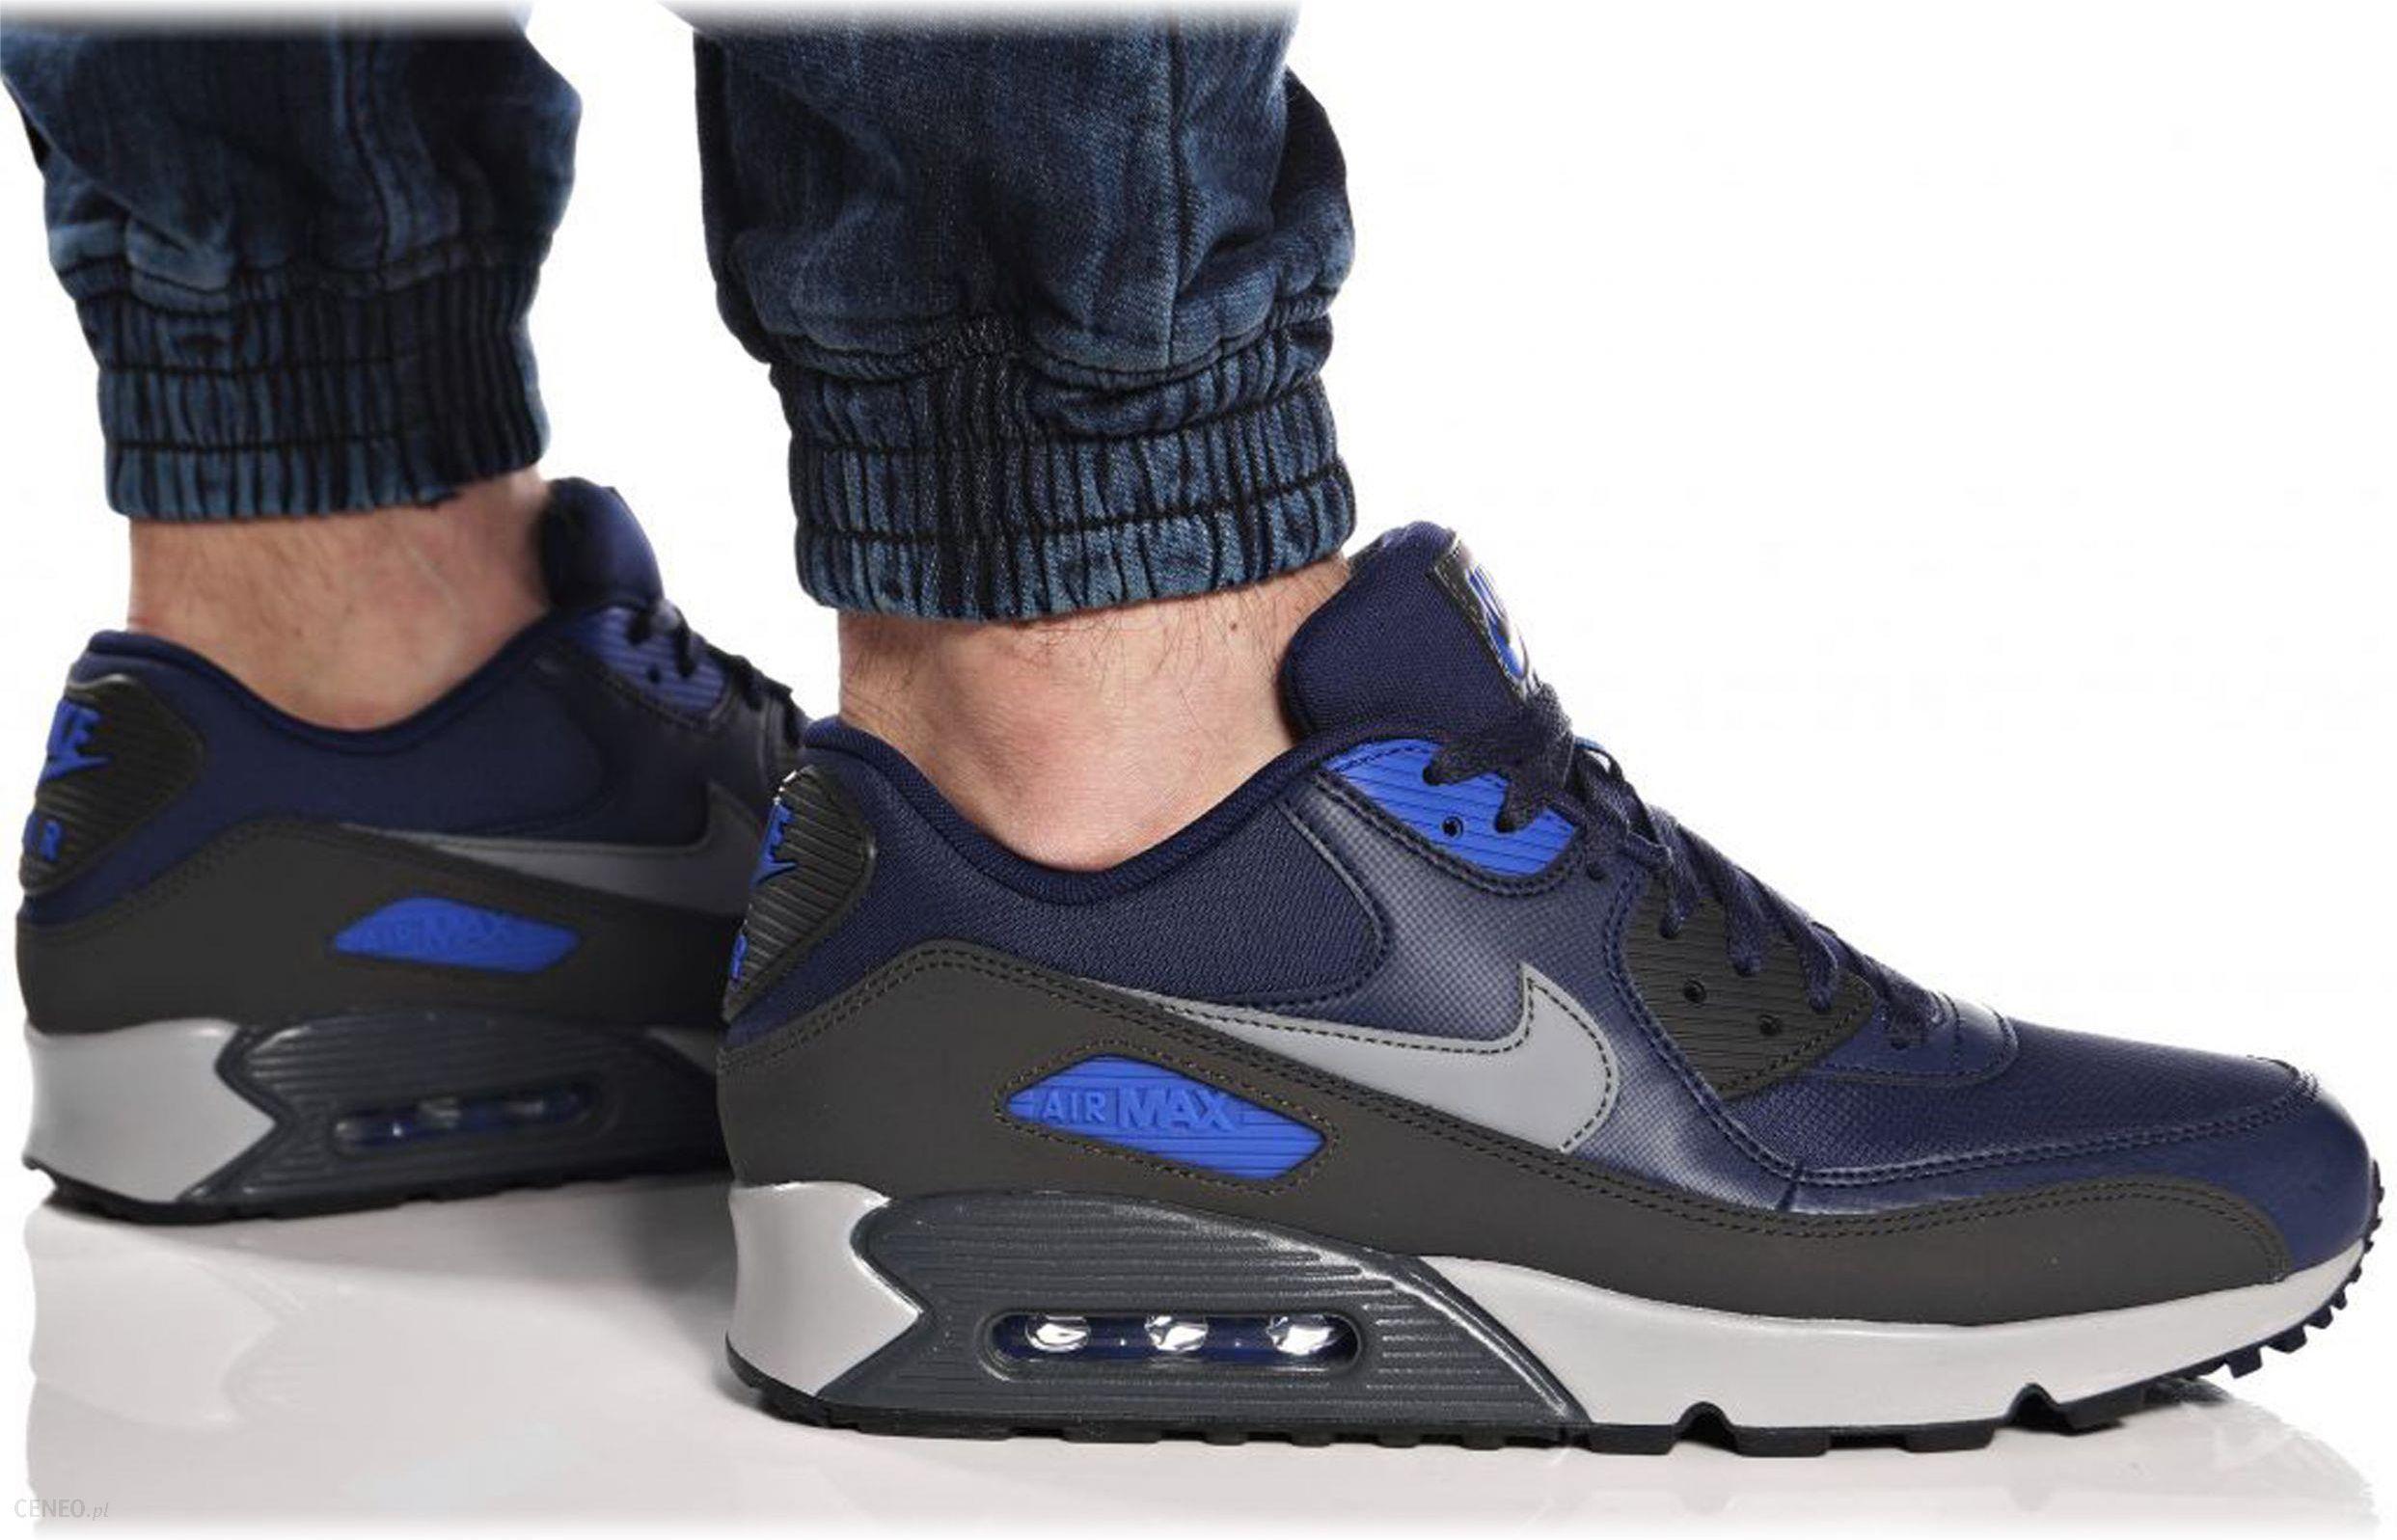 Buty Męskie Nike Air Max 90 Essential •cena 418,00 zł•Czarne